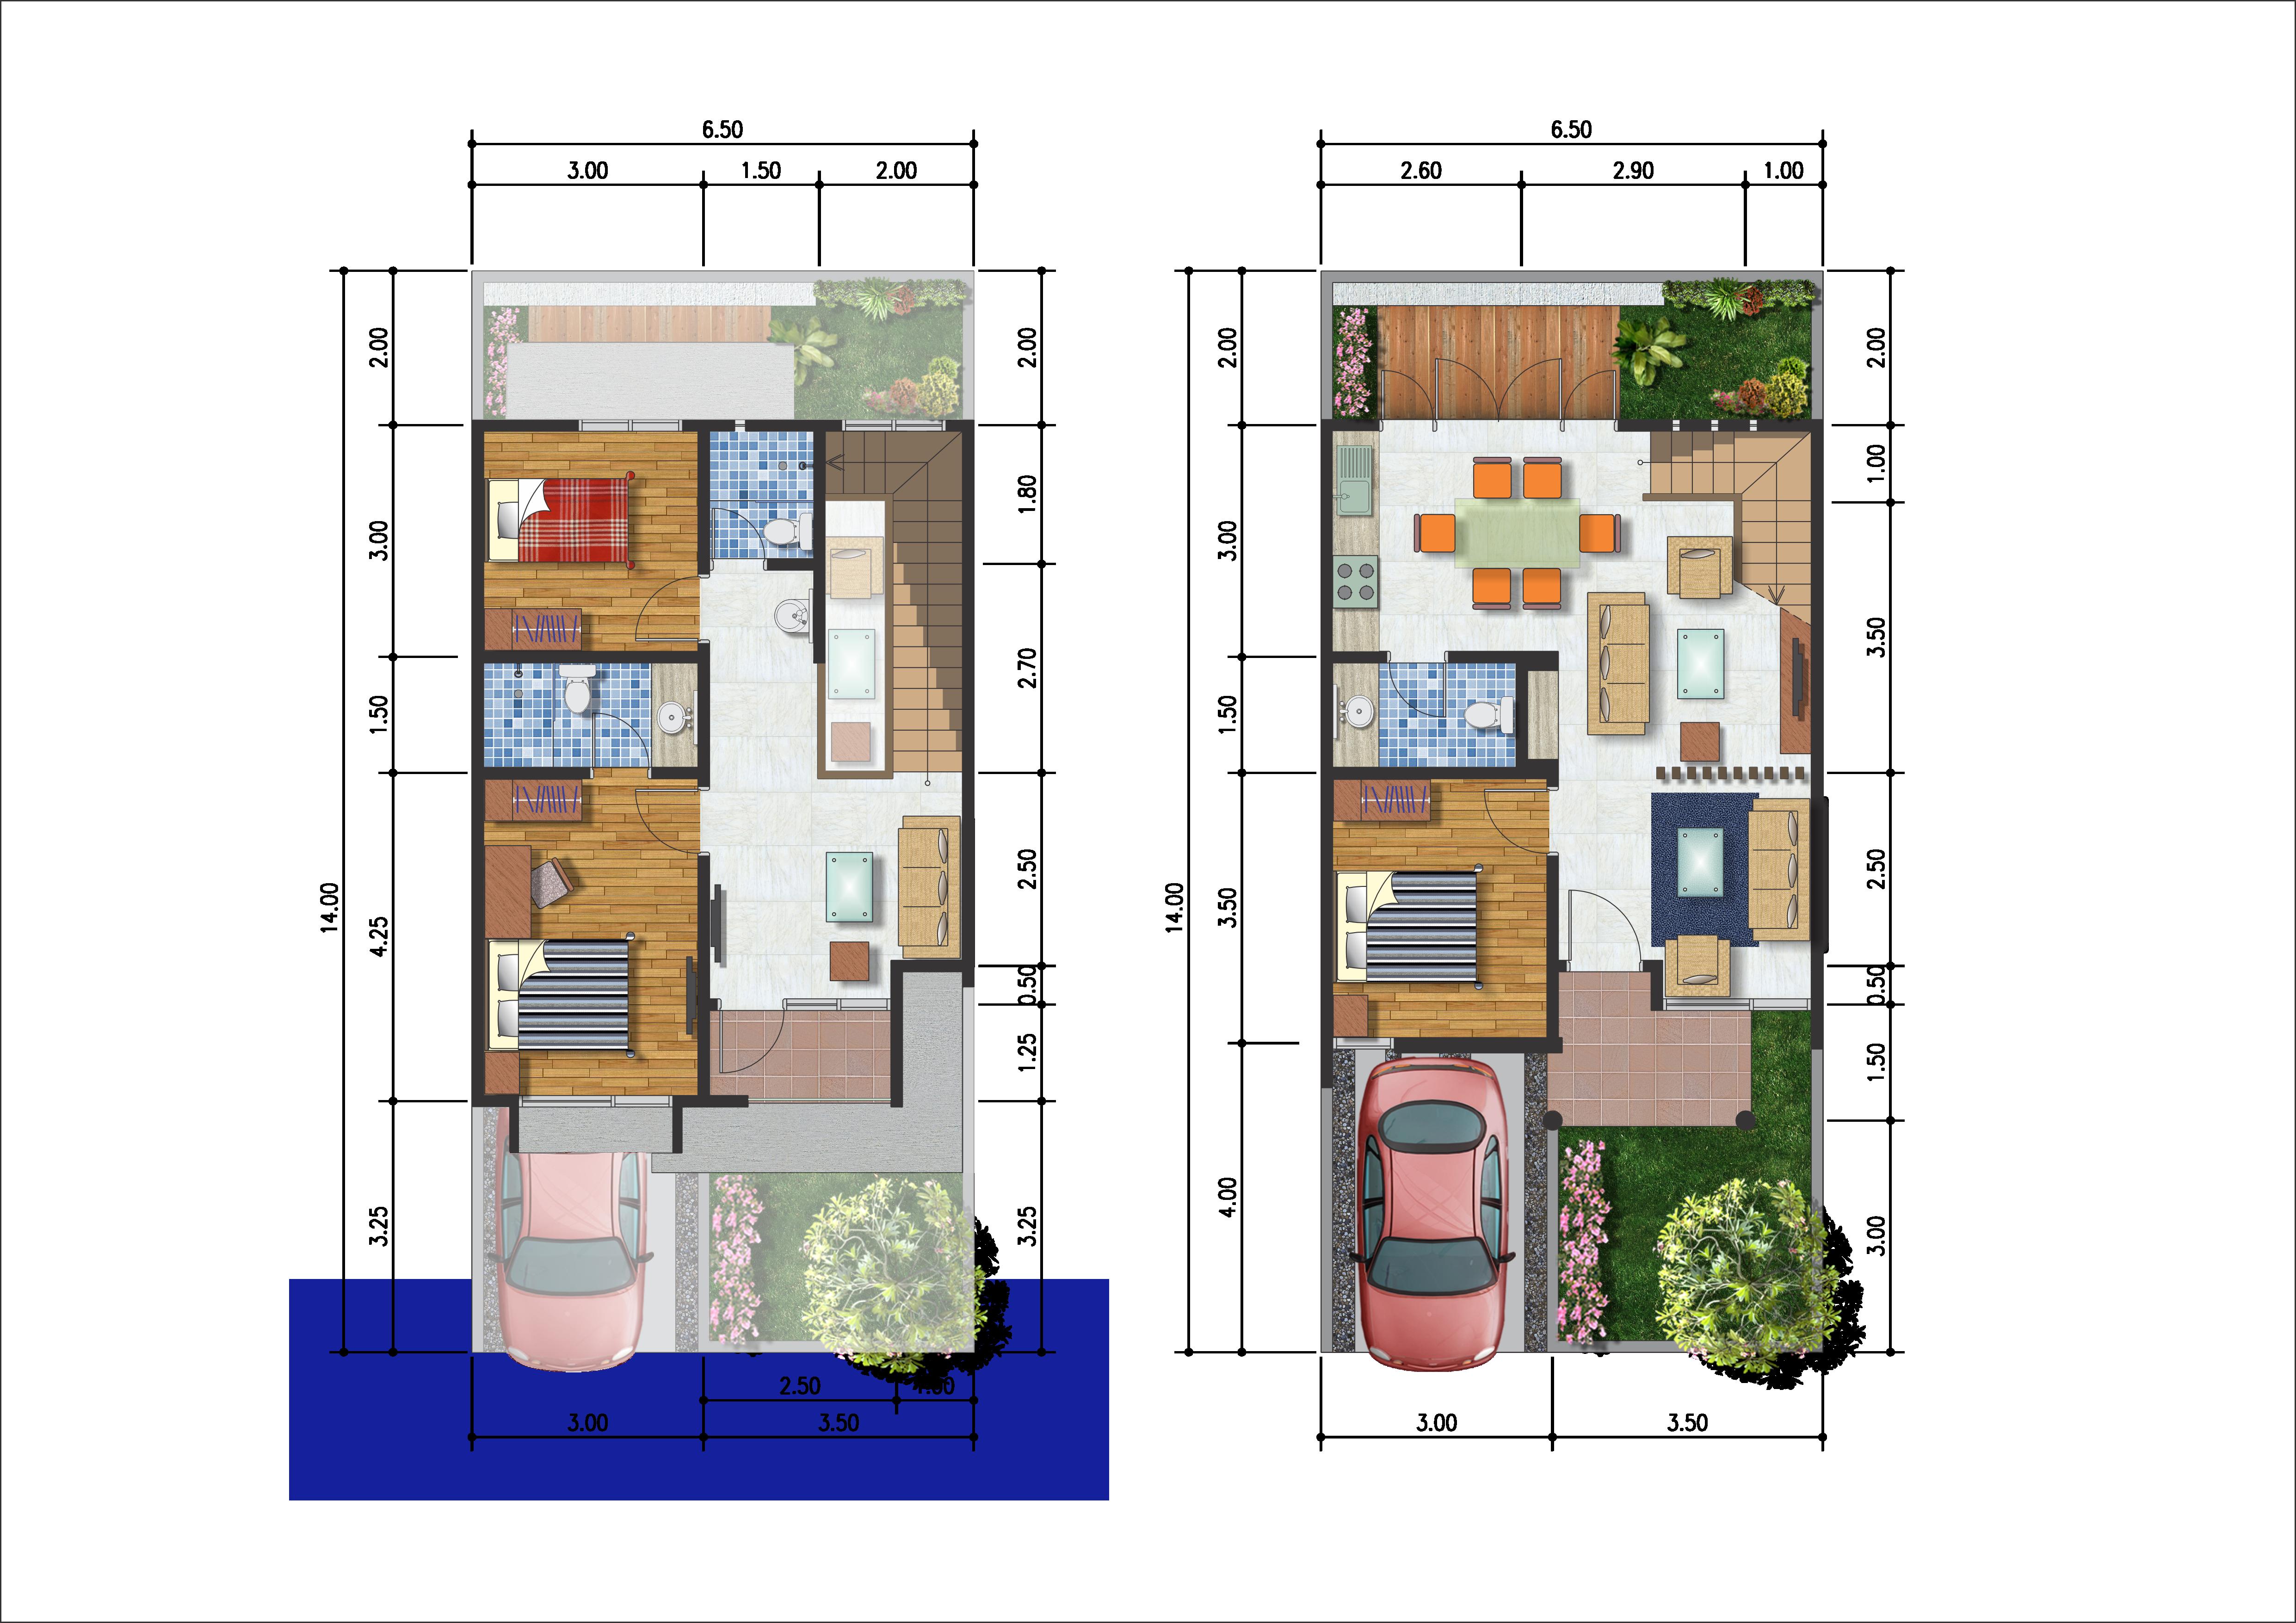 Townhouse Residential House Property Siteplan Arsitek Arsiteklokal Arsitekturtropis Arsitekturmodern Arsitekturminimalis Depok Propertiindonesia Ru